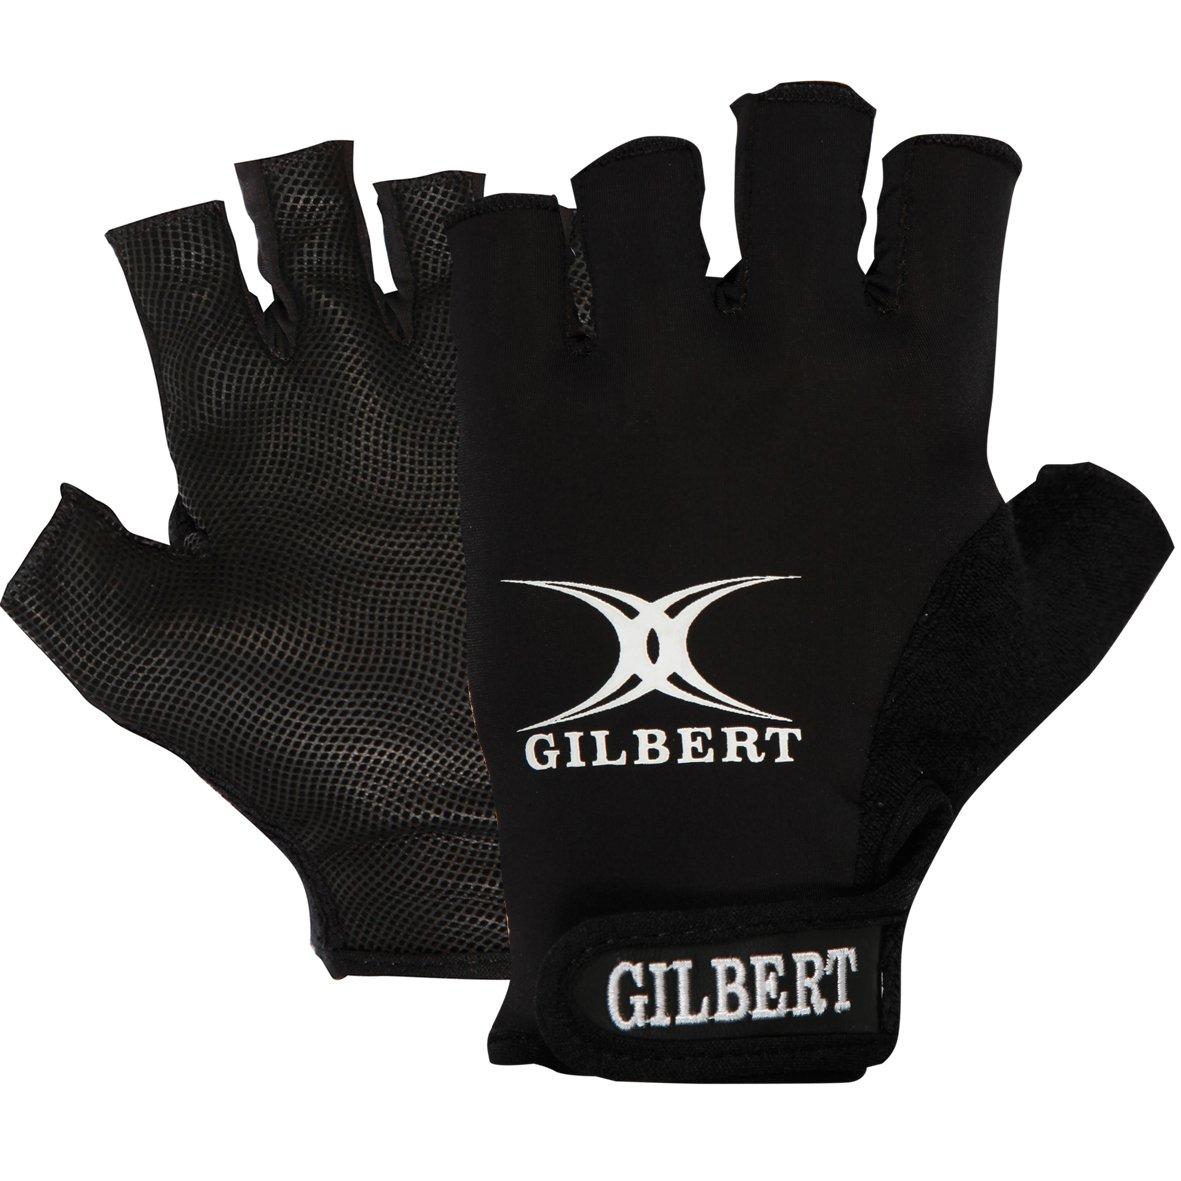 tama/ño S Gilbert Synergie Guantes de rugby para hombre